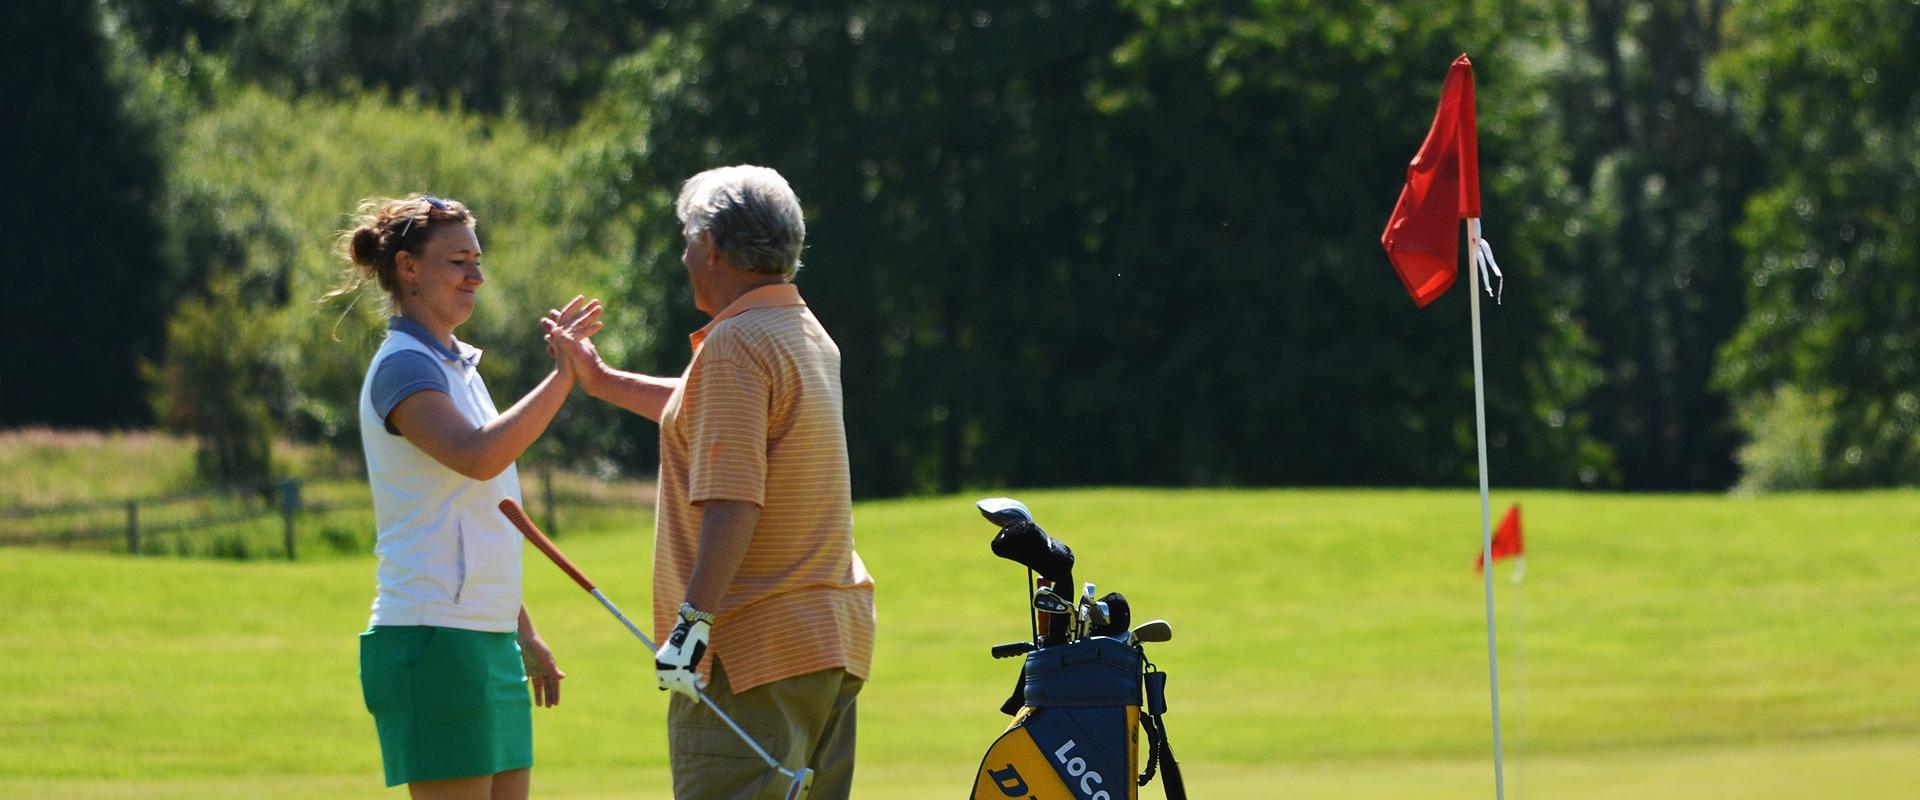 6 Week Beginners Golf Courses at Horsham Golf